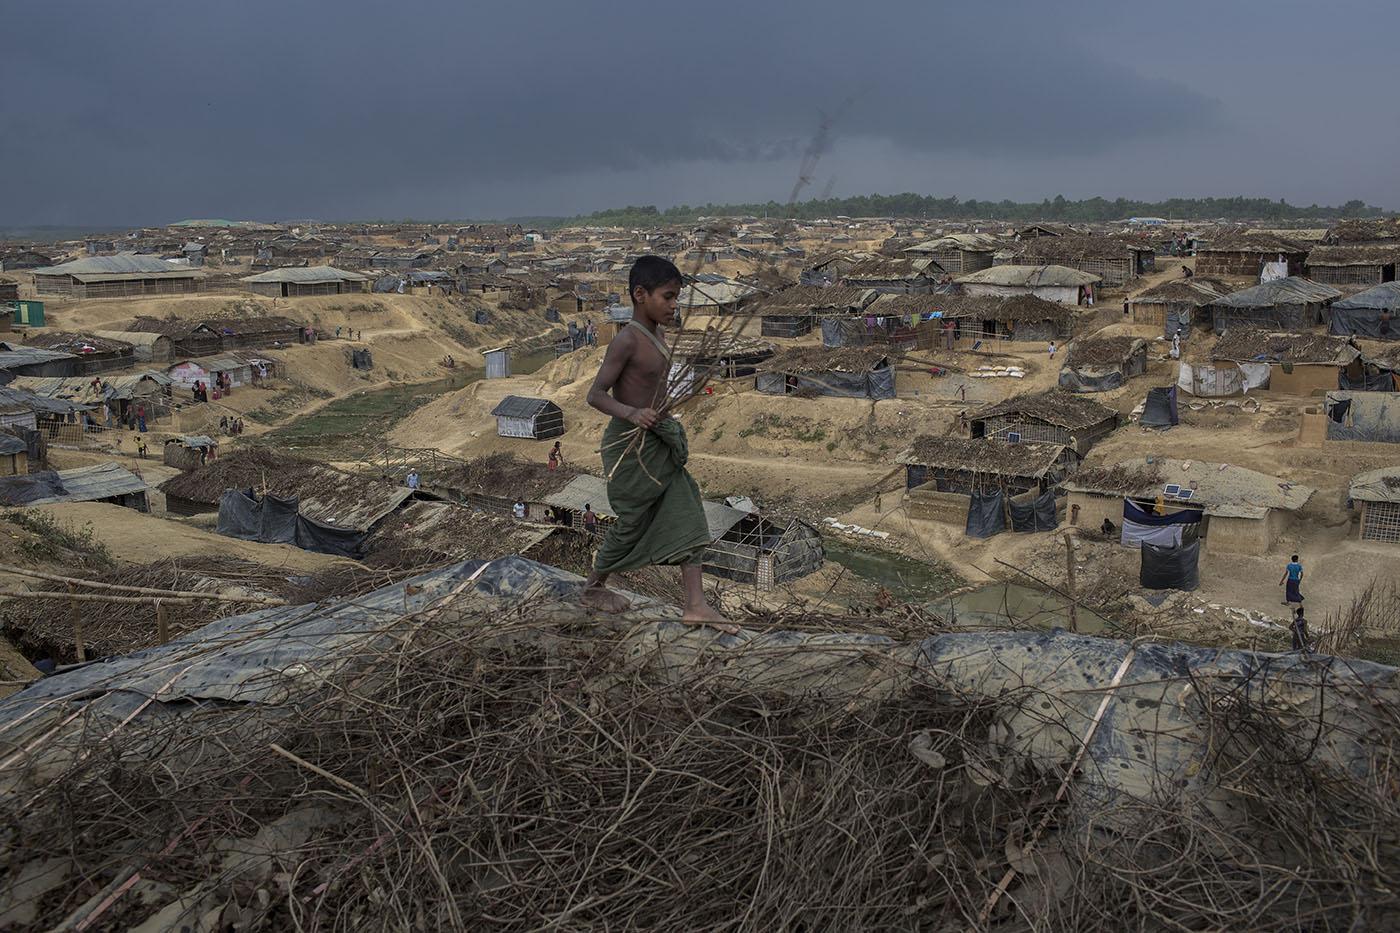 Probal Rashid_Bangladesh_The Rohingyas-A People Without A Home_01.jpg